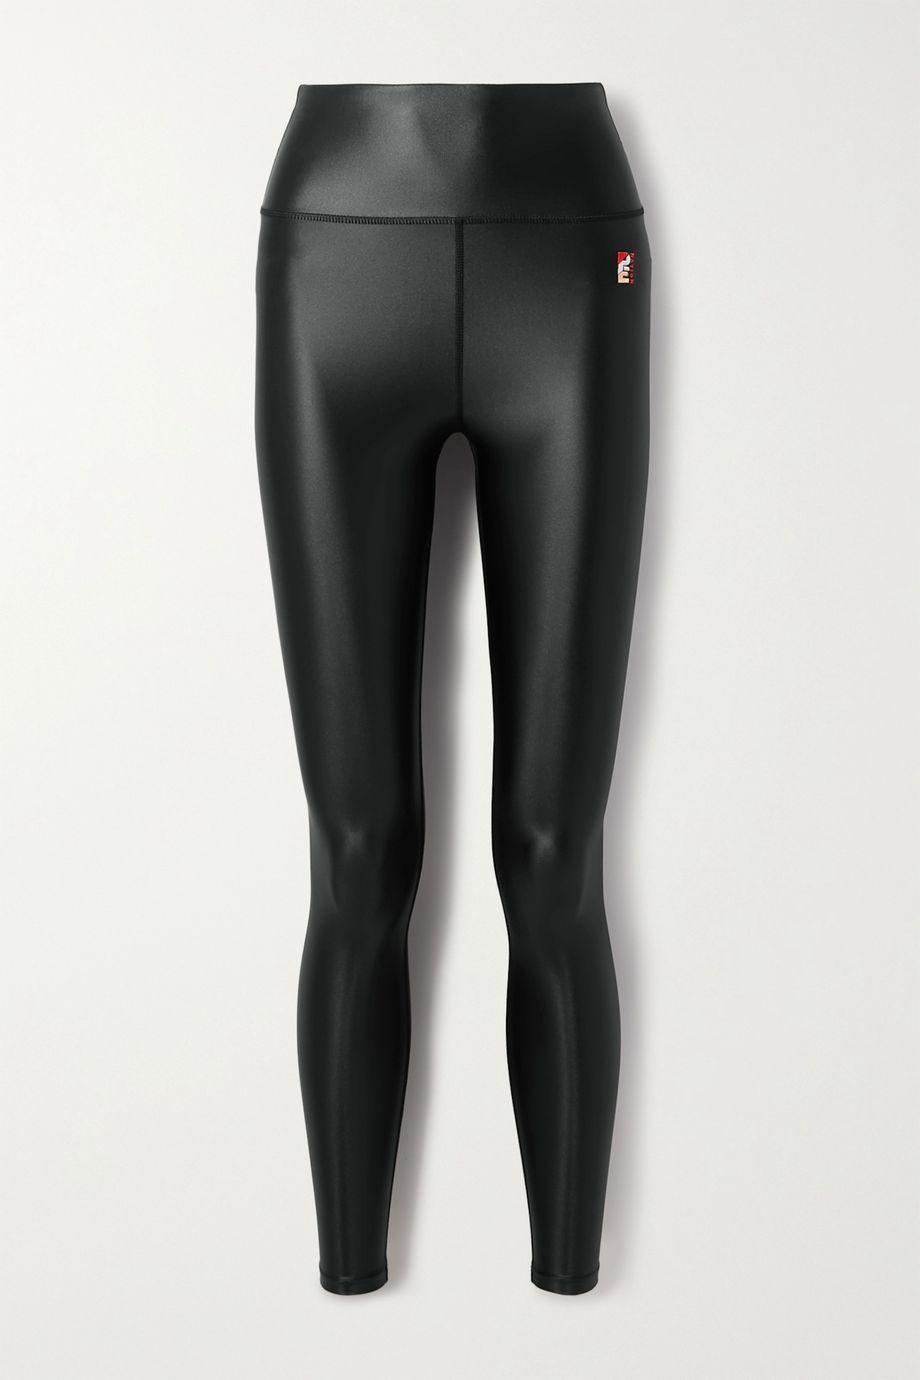 P.E NATION Round Up metallic stretch leggings